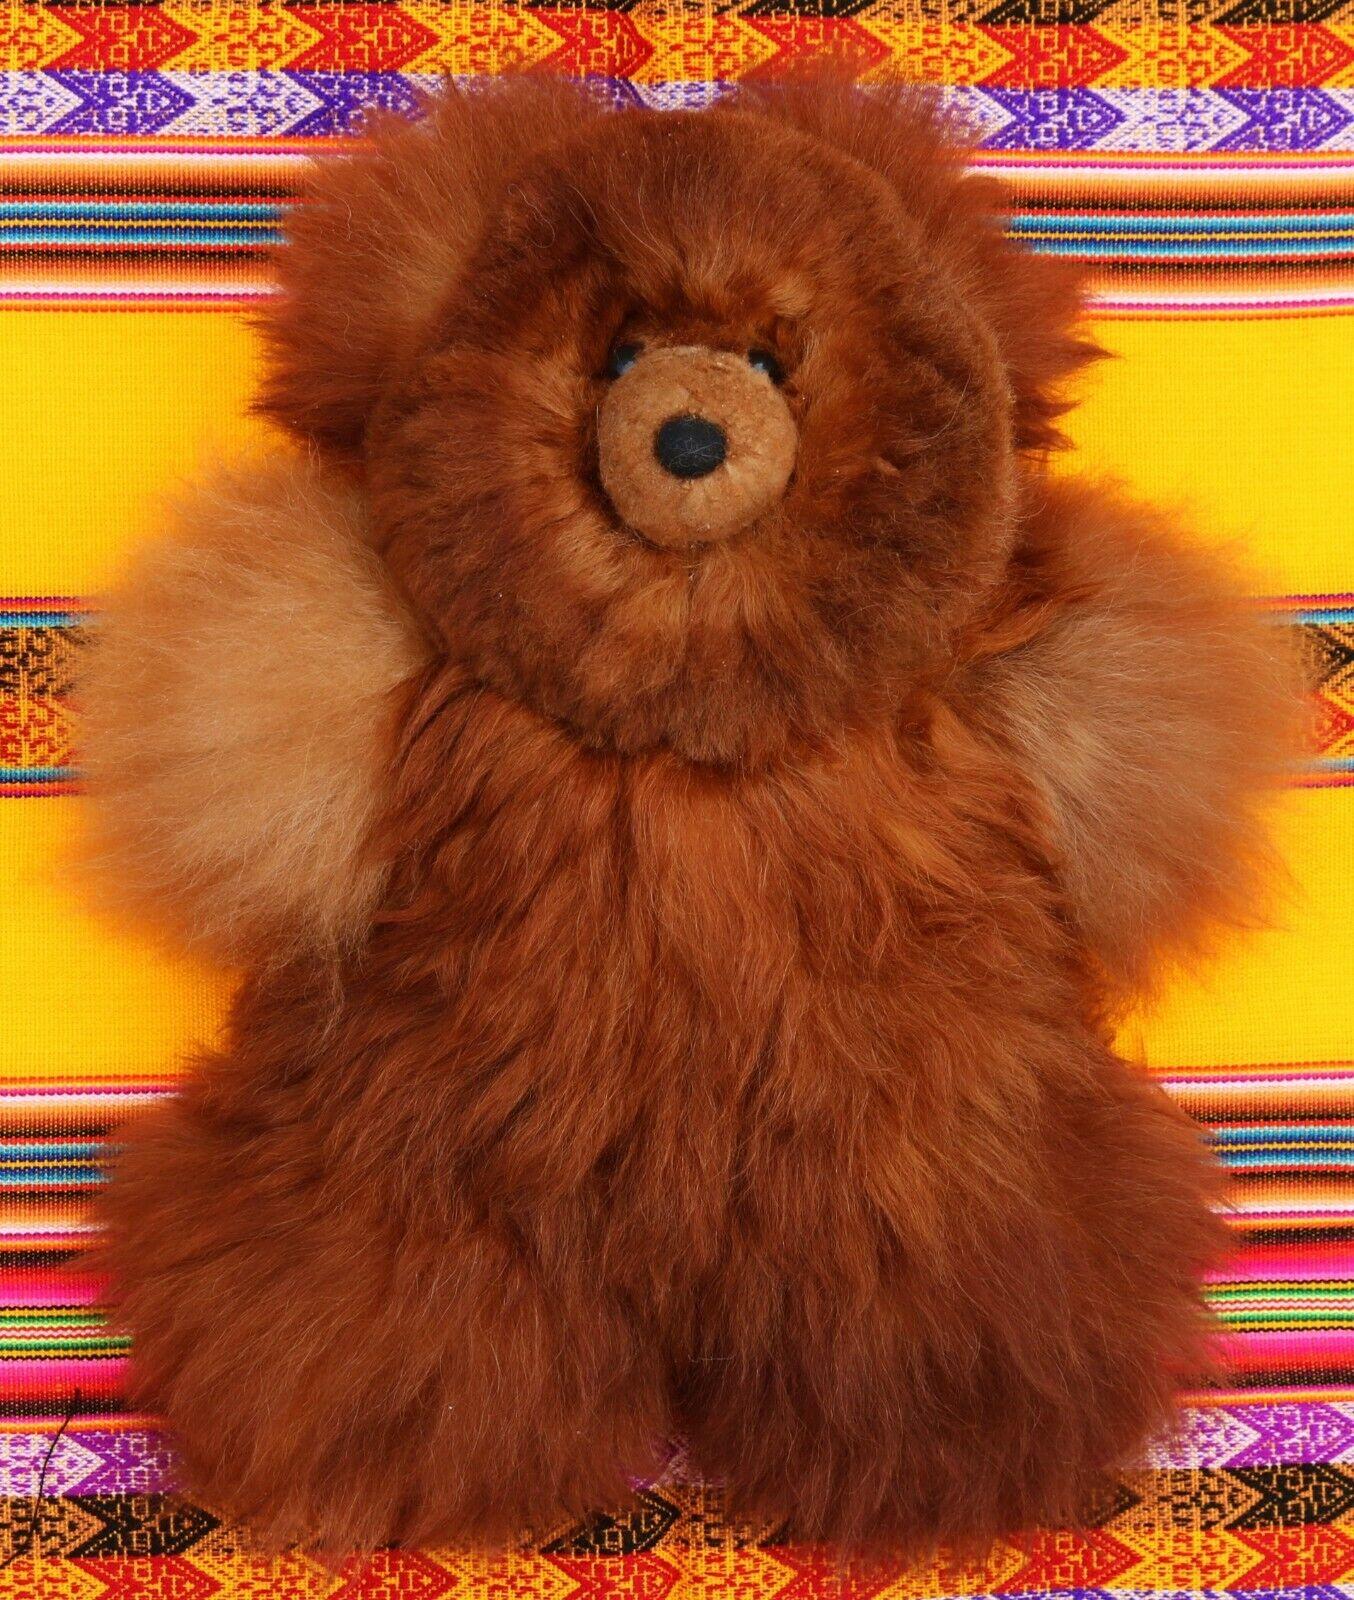 Teddy da Alpaca pelo 39-40 cm, Baby alpaca pelliccia naturale marrone, naturale pelliccia decorazione Perù